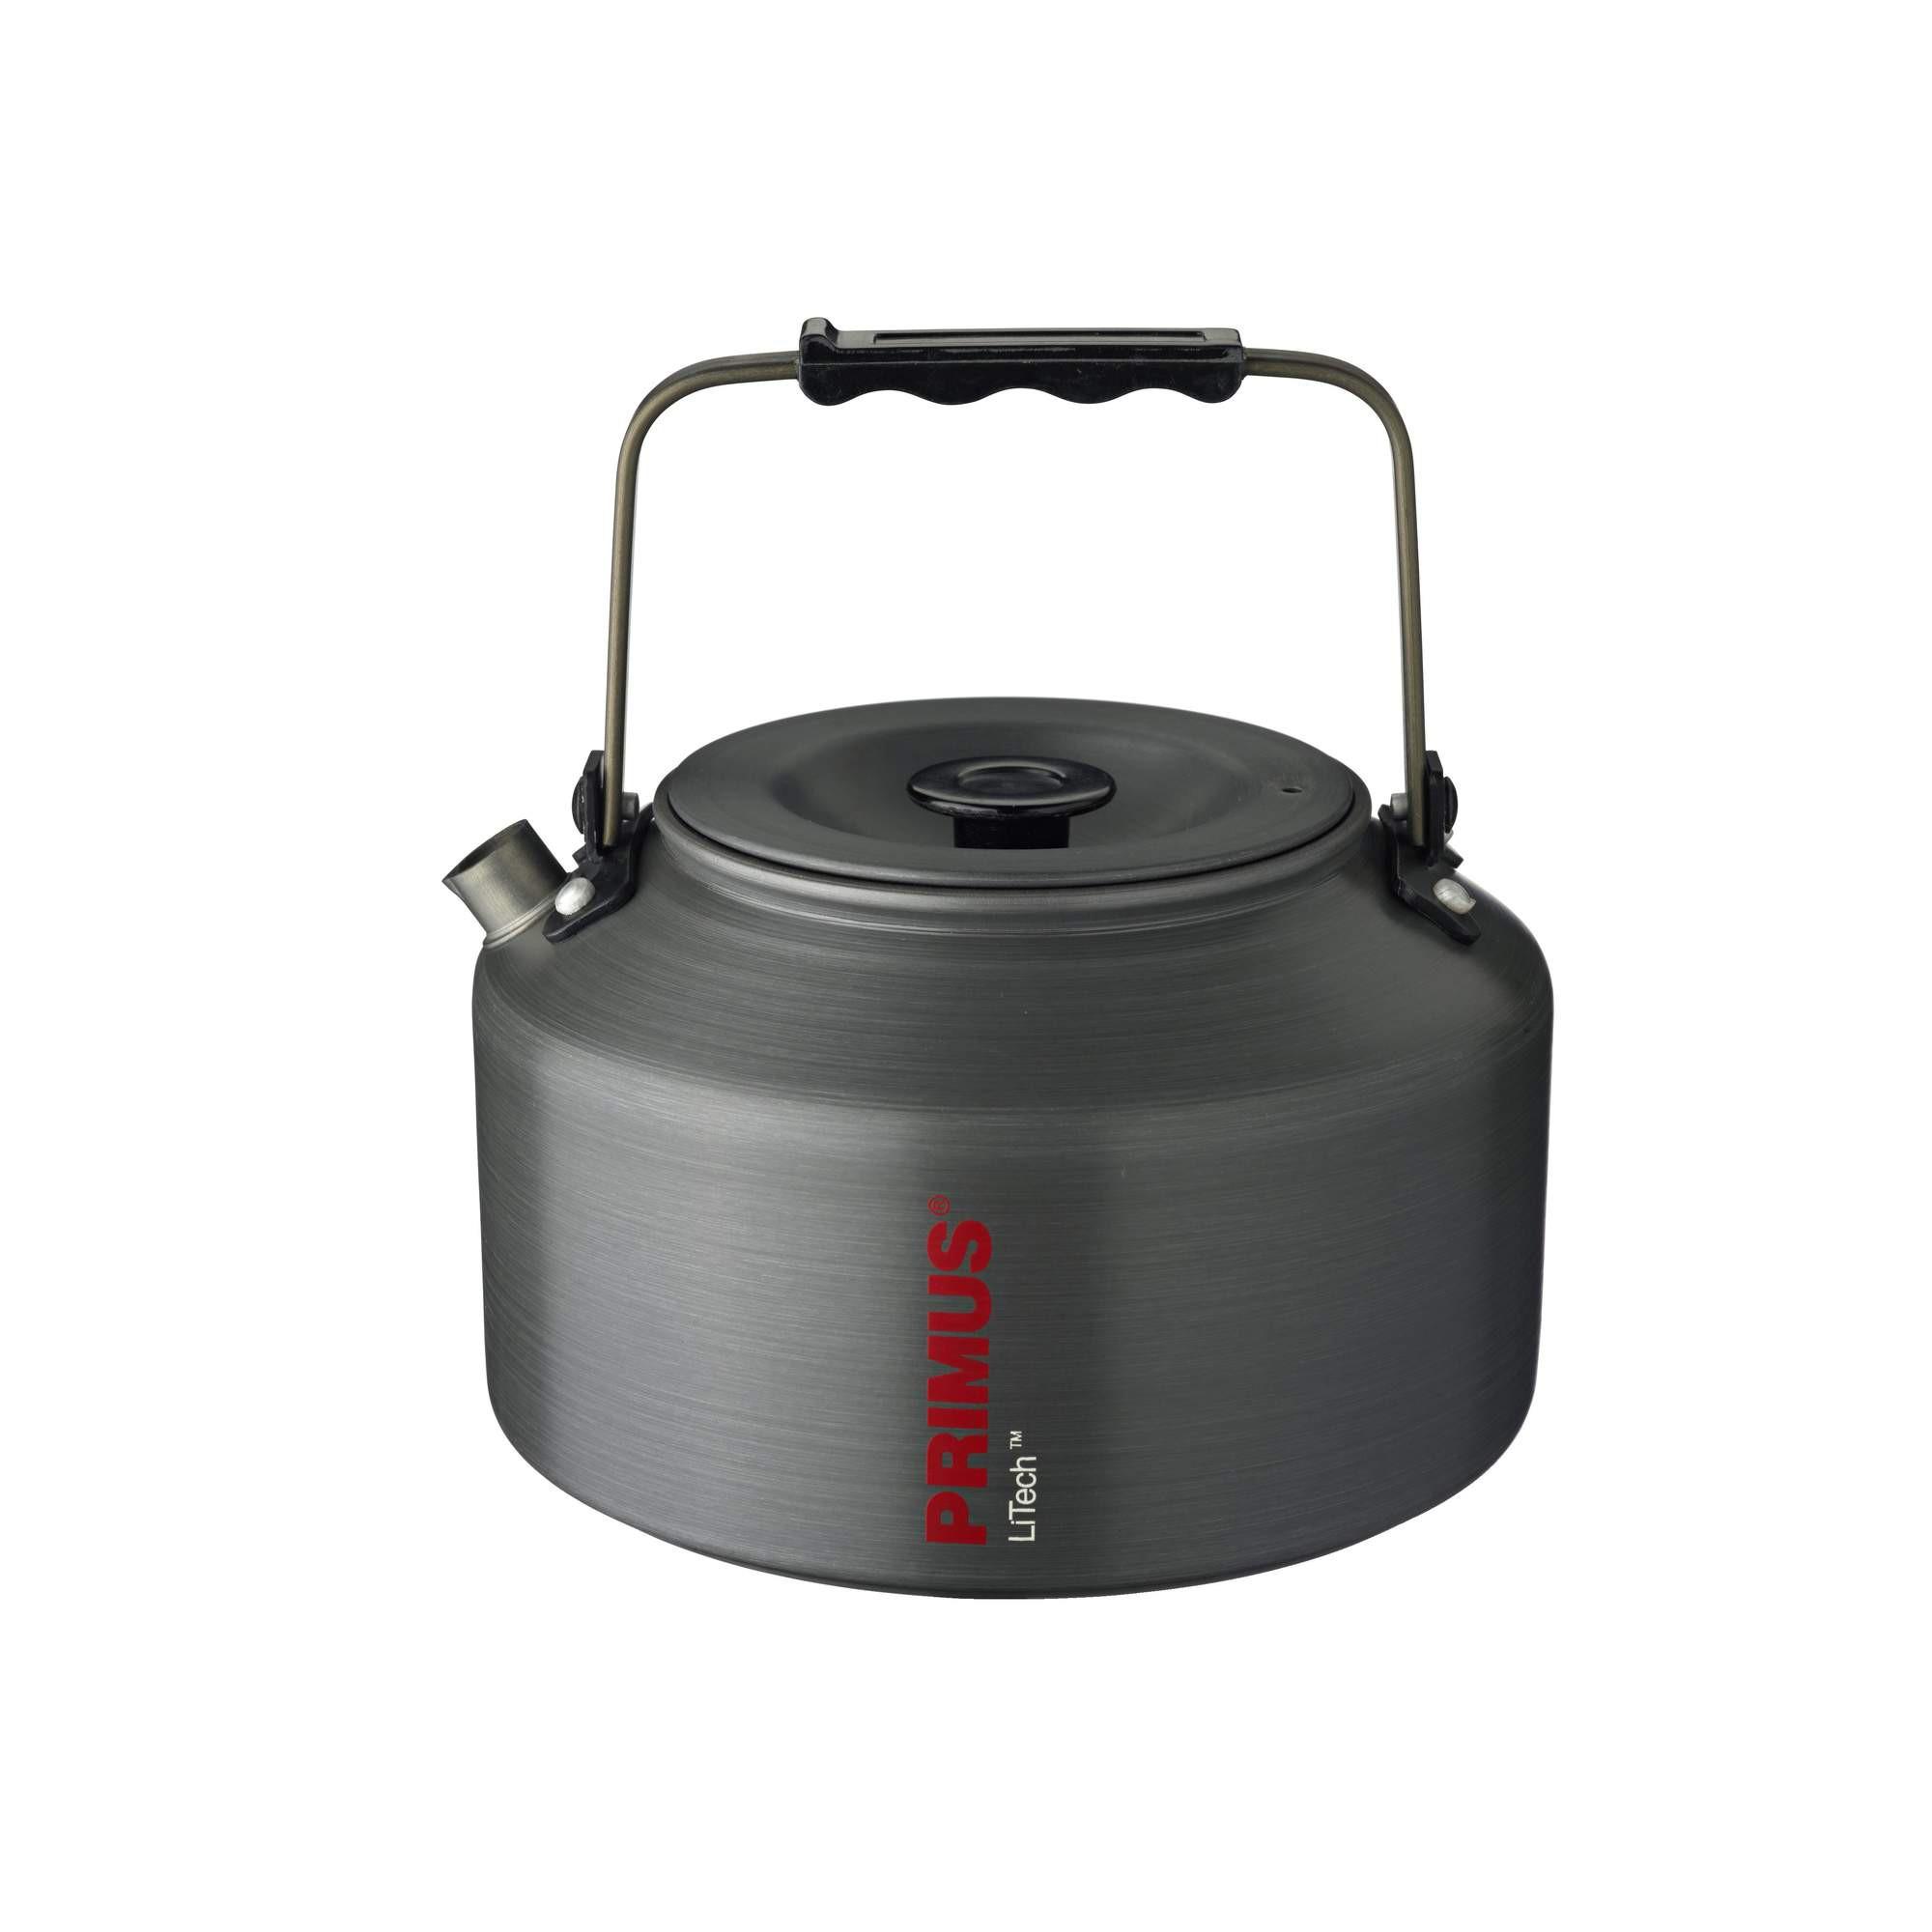 Primus Litech Coffee/Tea Kettle 1.5 L